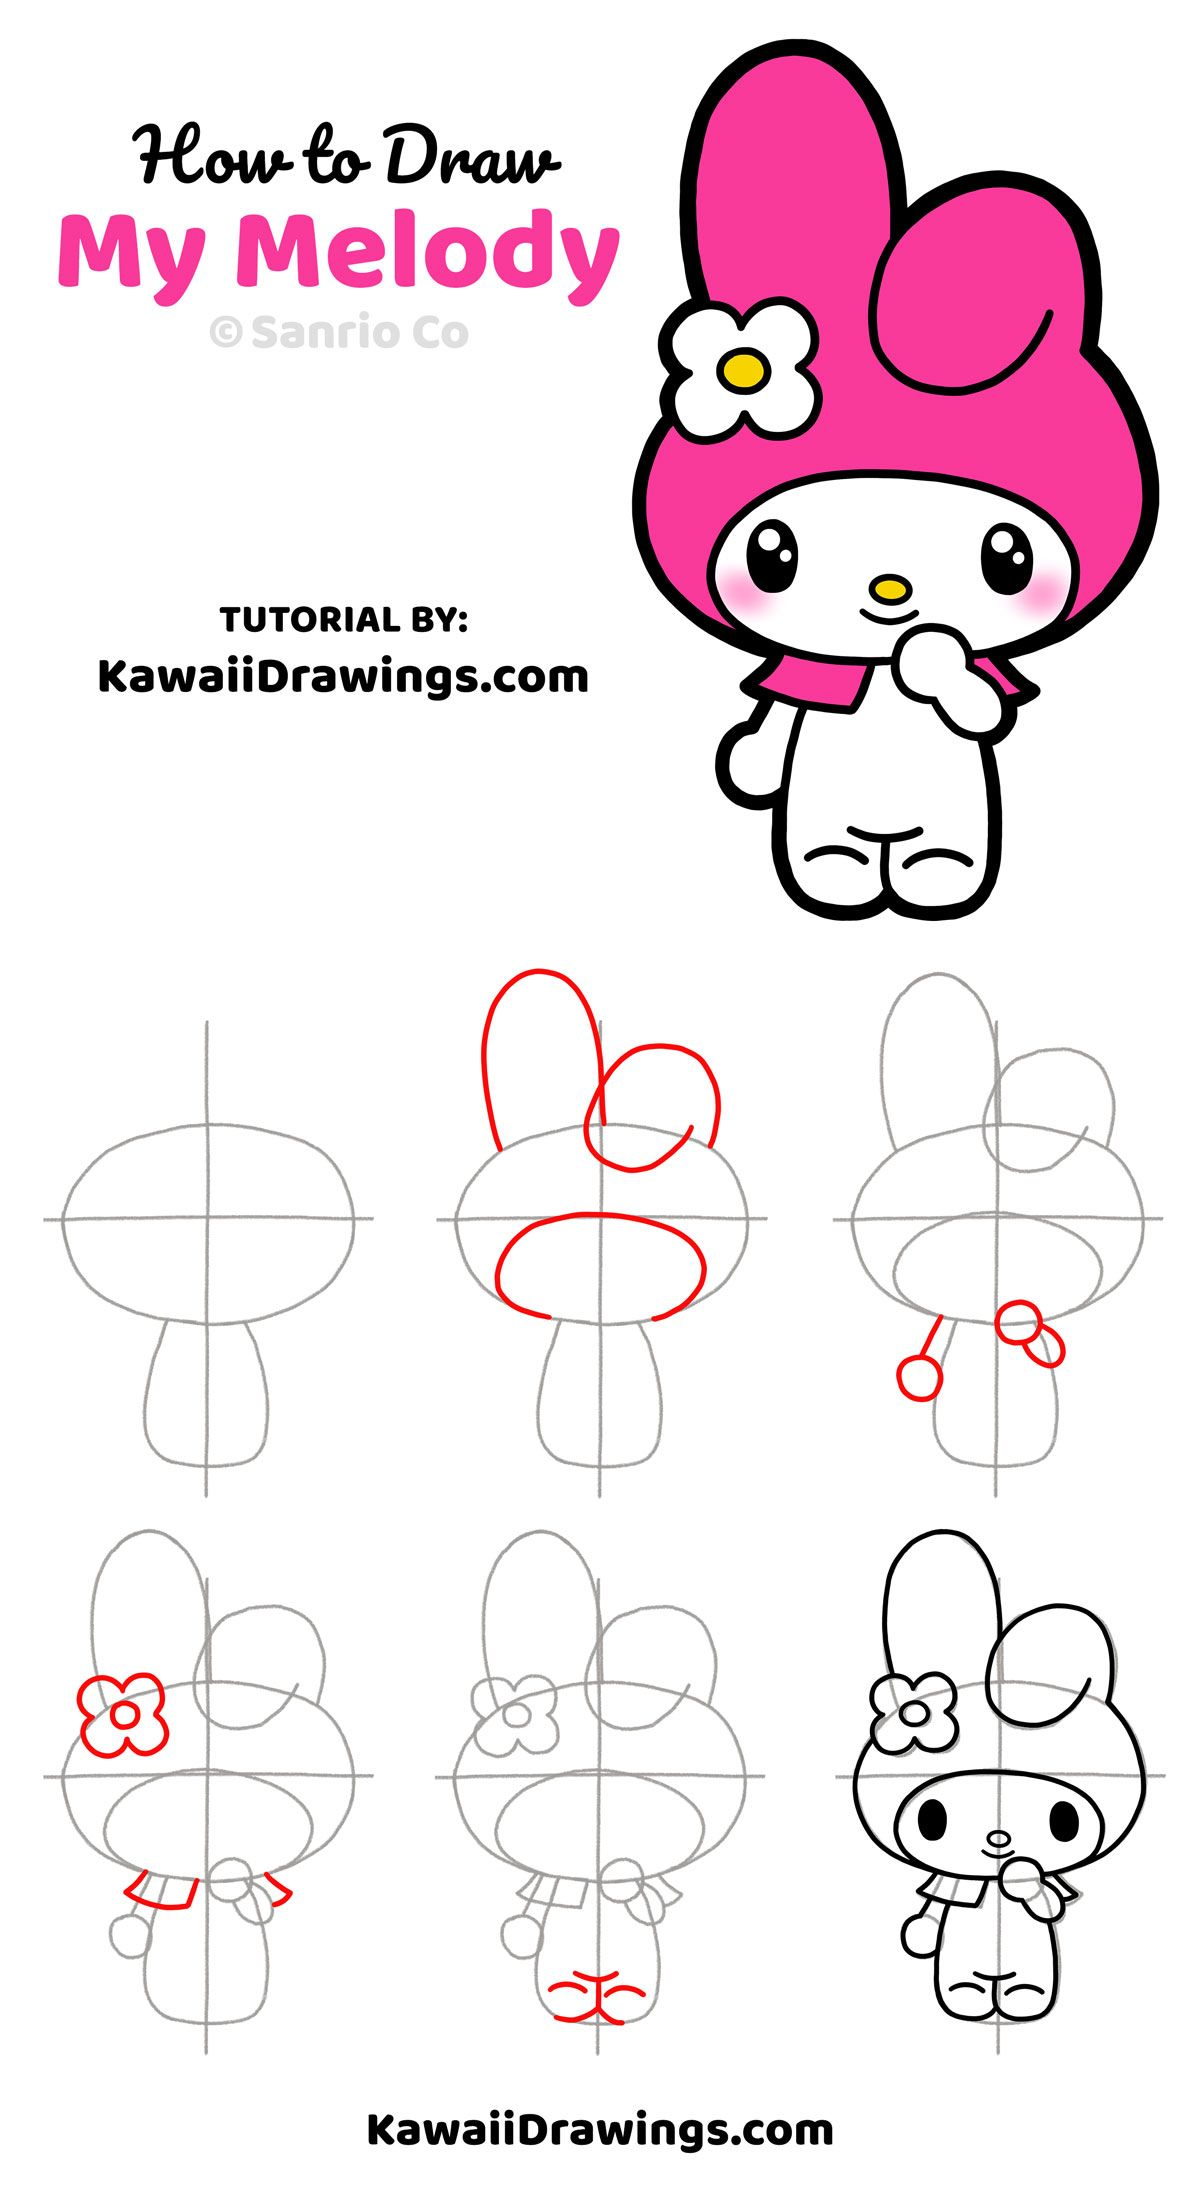 Easy stepbystep drawing tutorial to draw My Melody